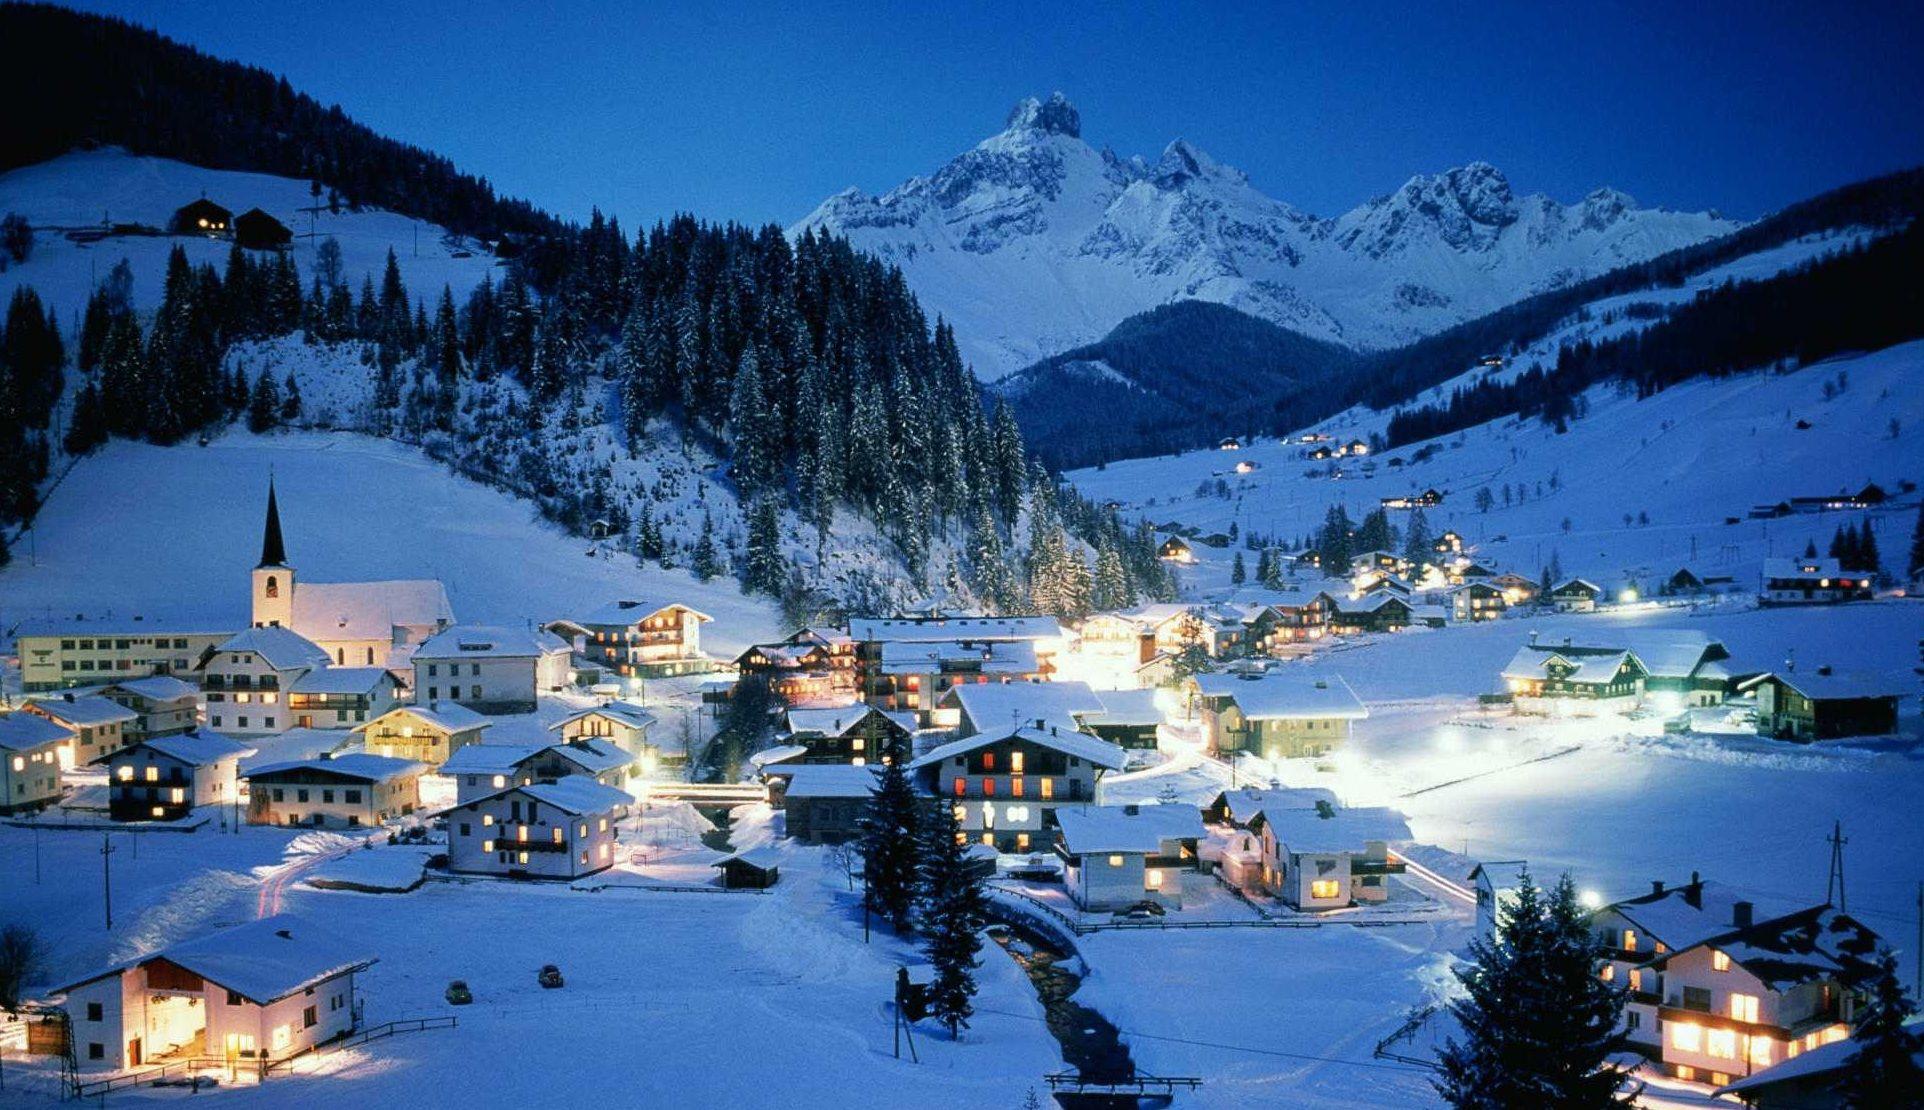 Ischgl, Austria